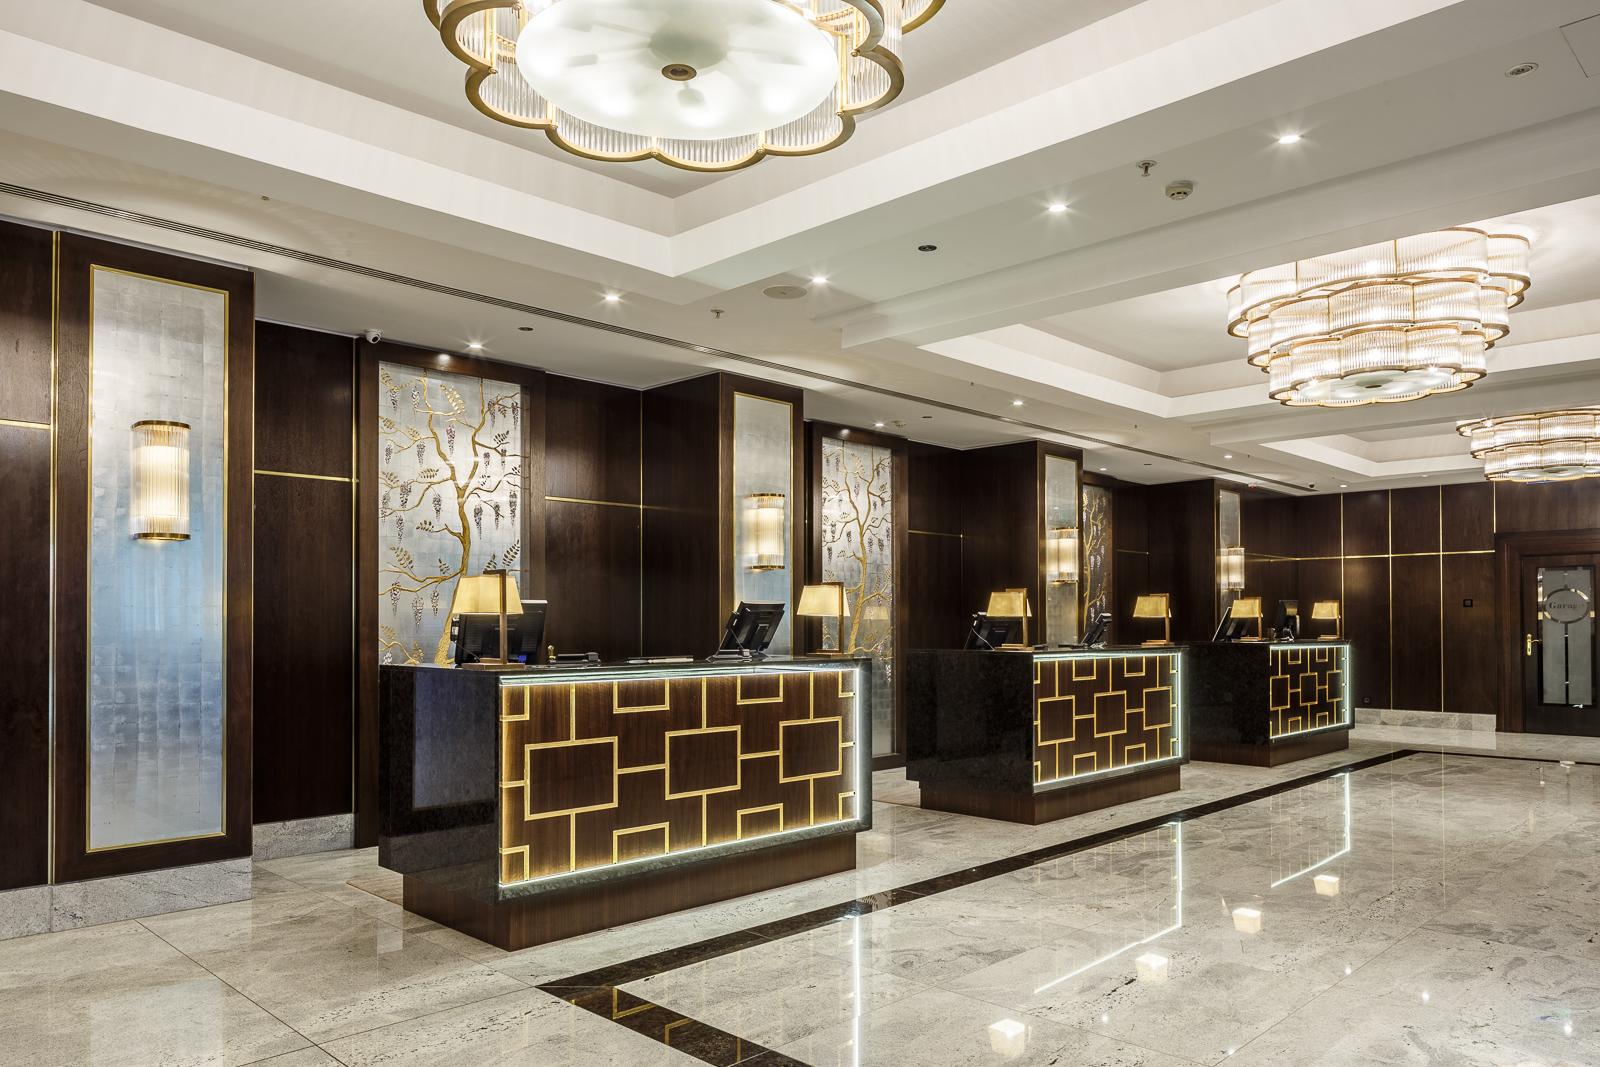 Hilton Hotel Goddard Littlefair Archello